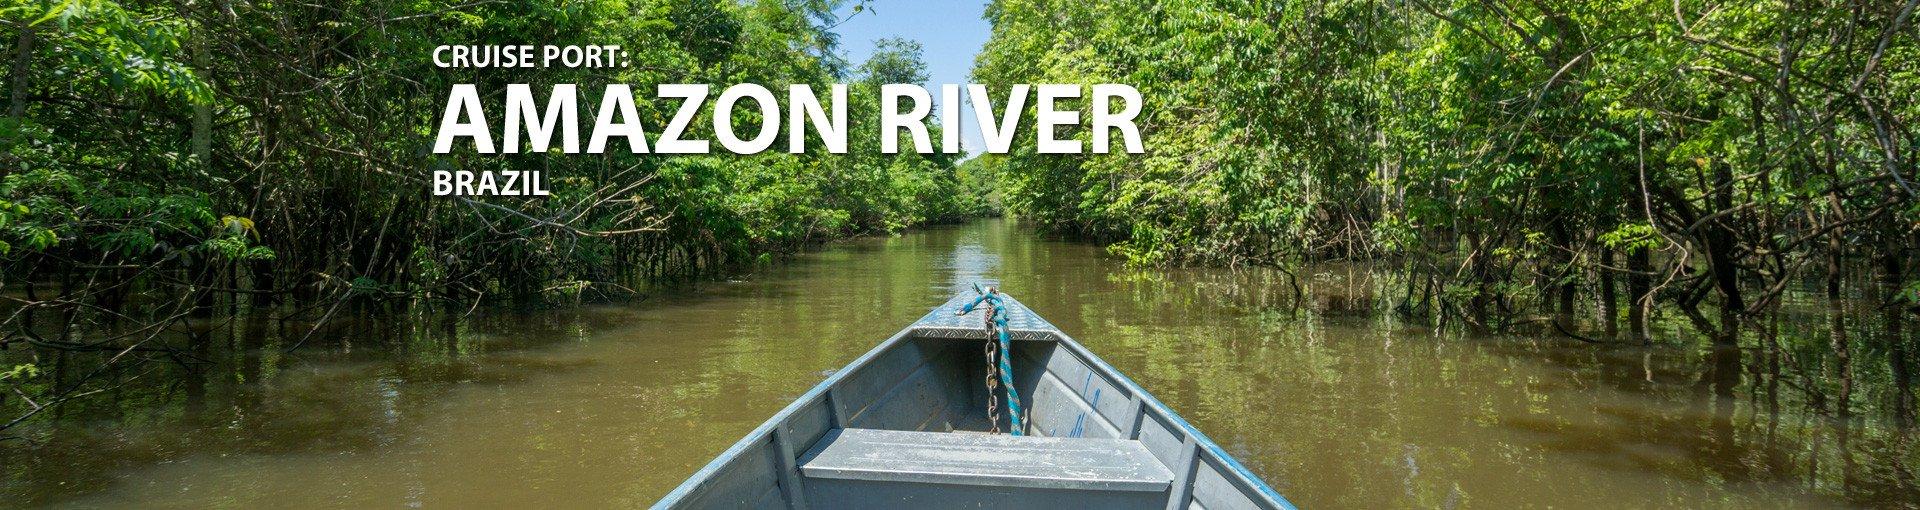 amazon-river-brazil-cruise-port-banner